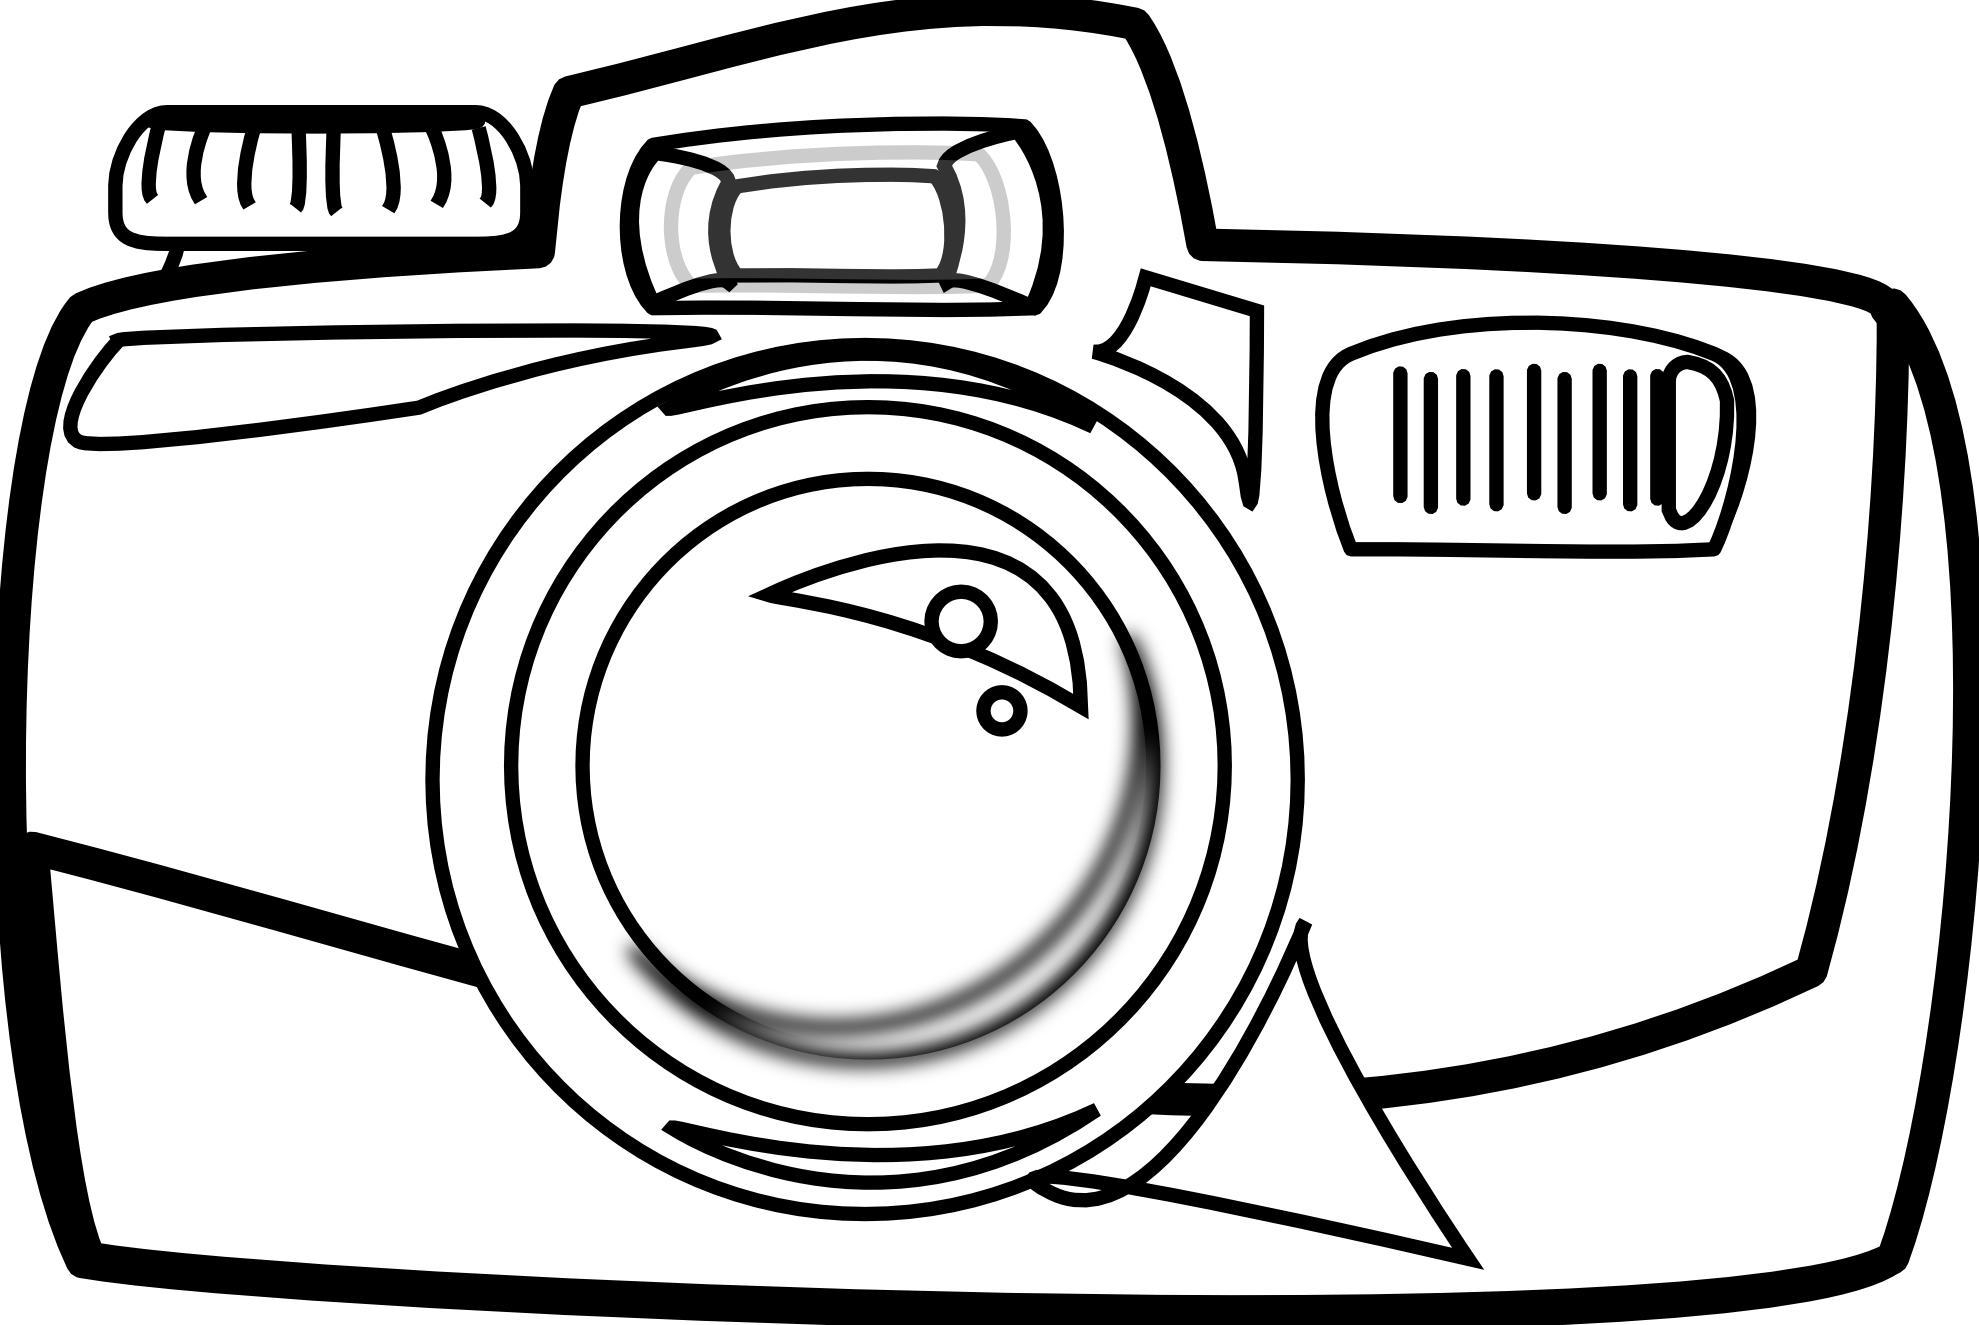 Line Drawing Camera : Camera vector art clipart best